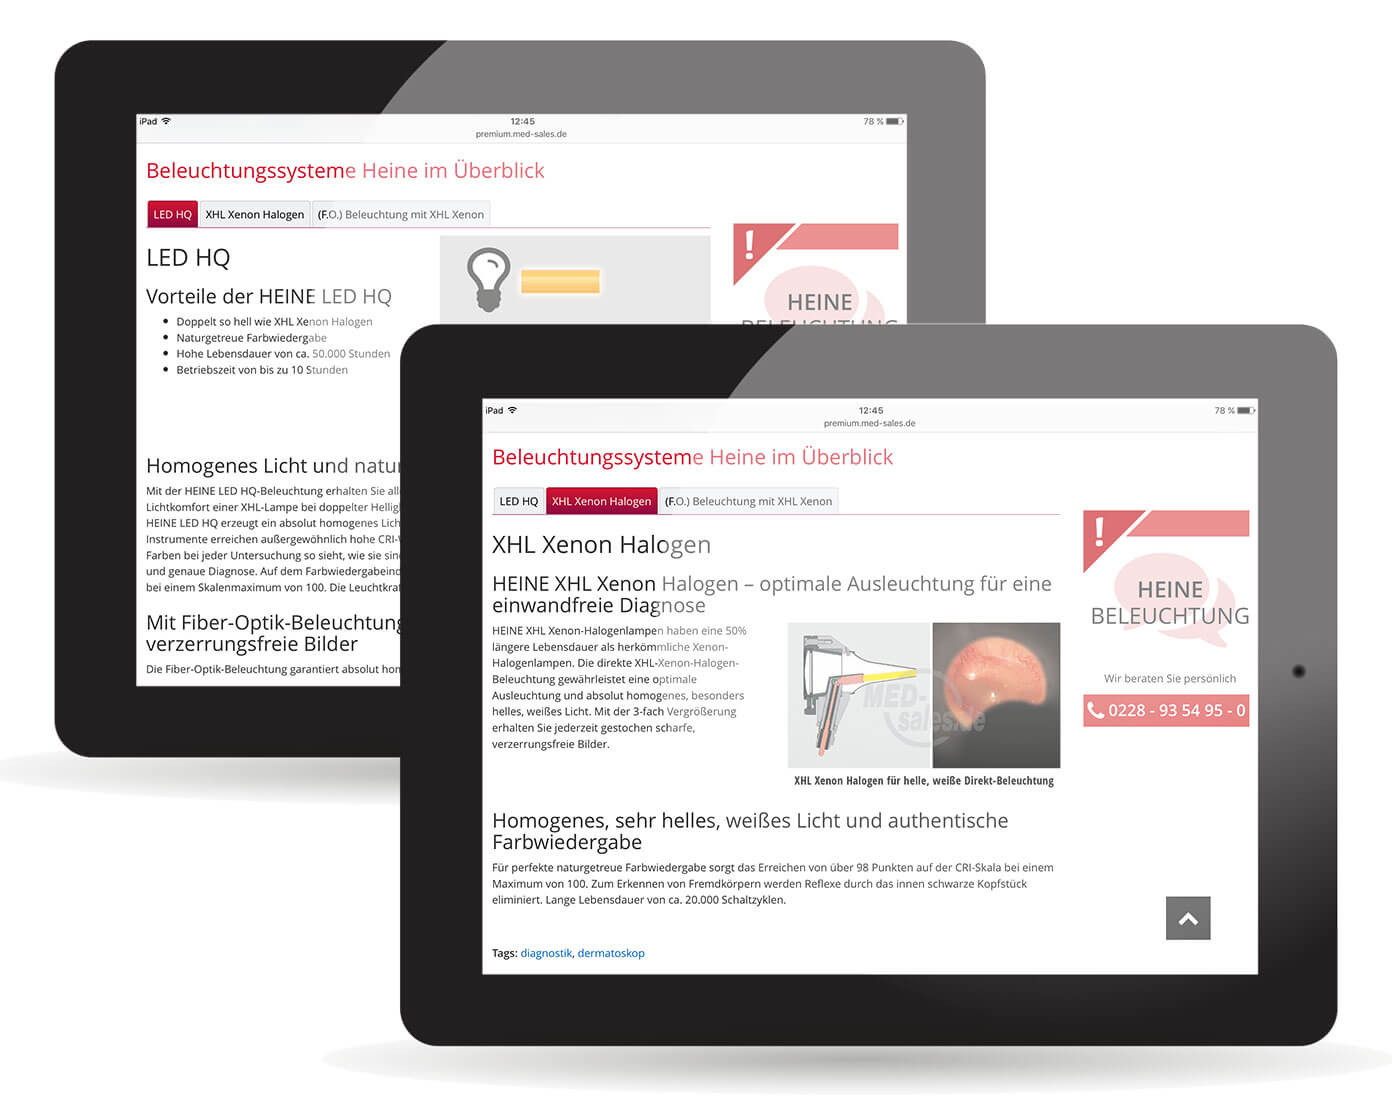 Arztpraxis Katalog Online Shop F R Den Medizinischen